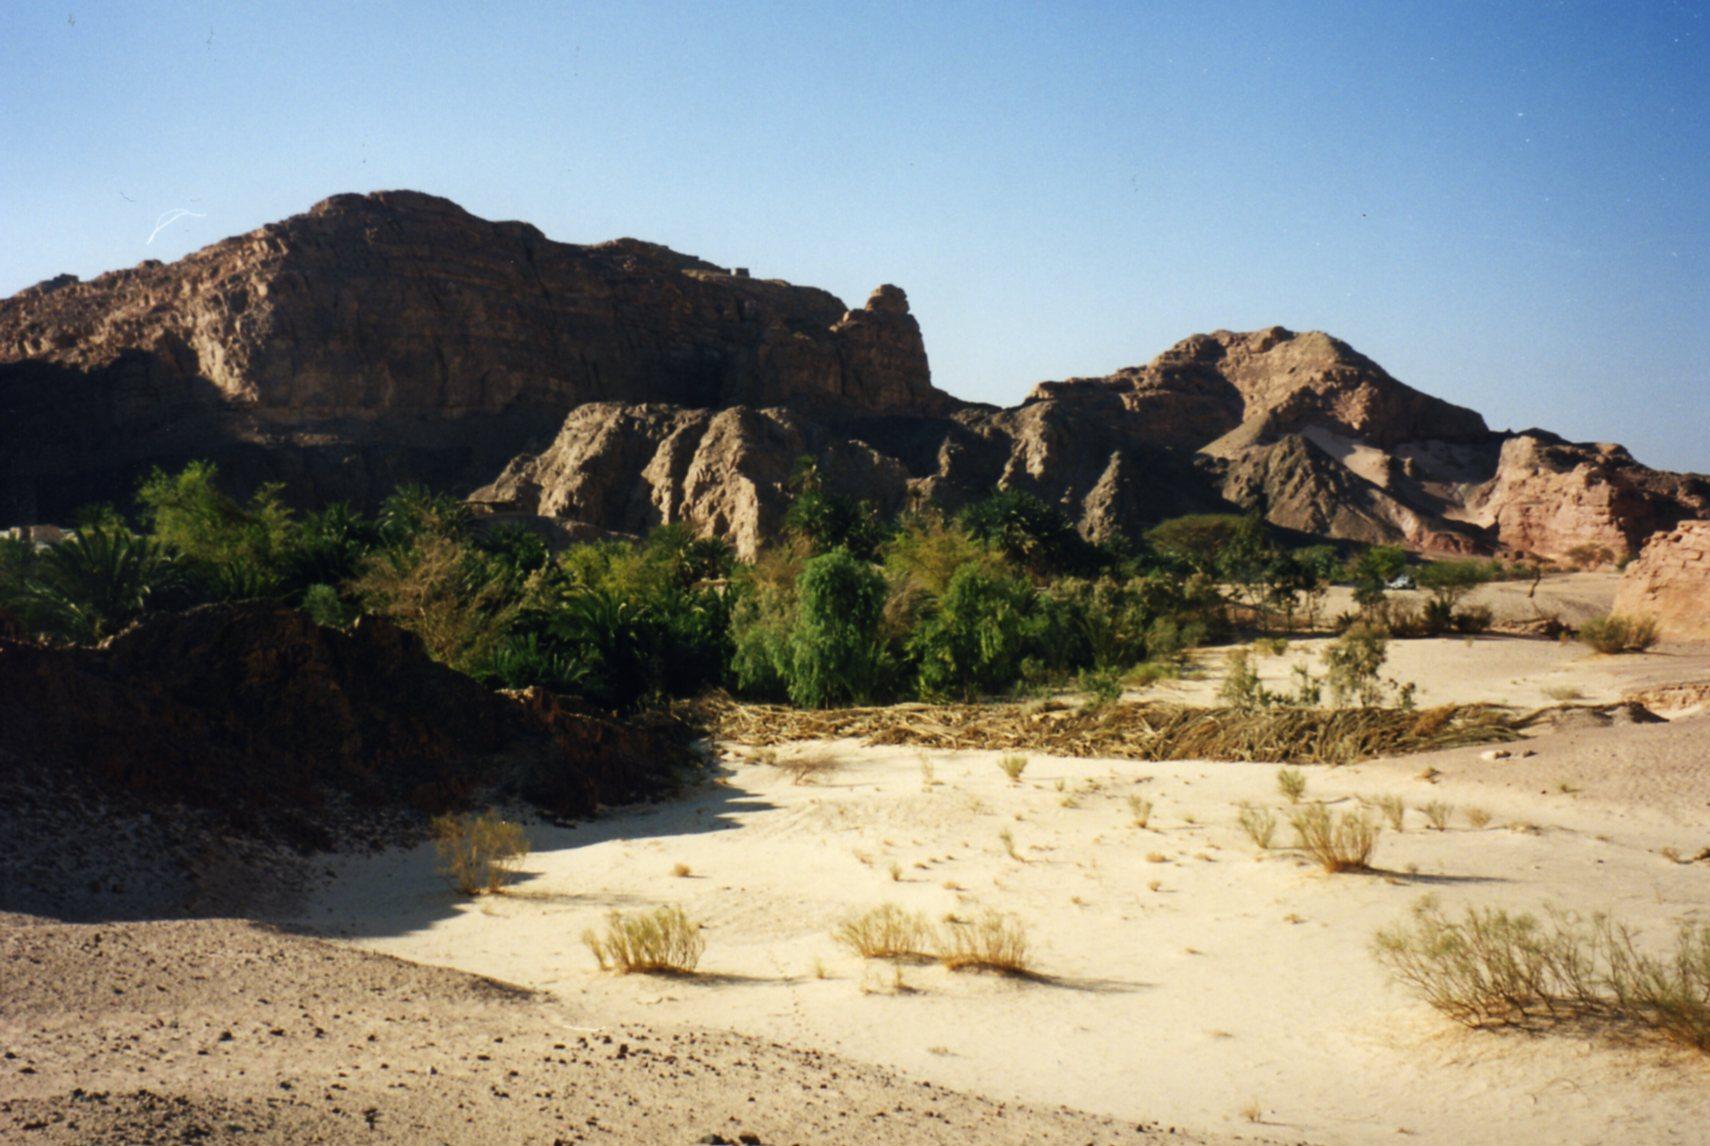 The oasis in the Sinai desert